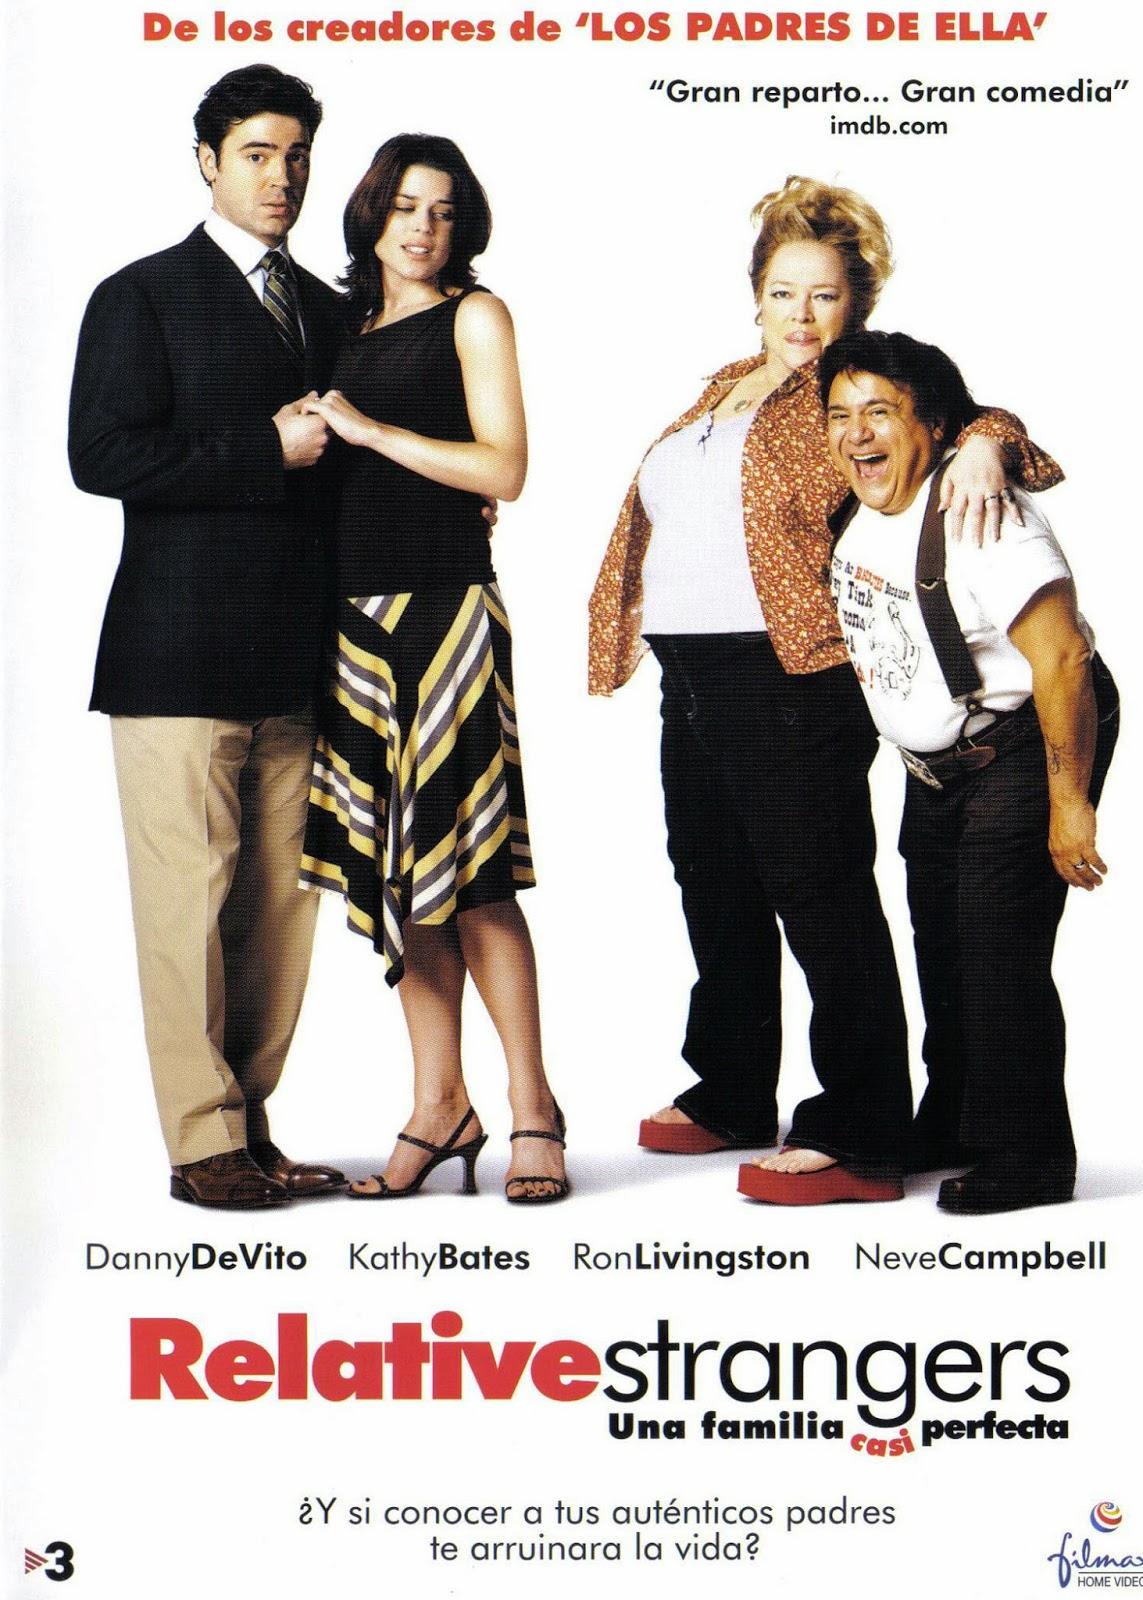 Una Familia Casi Perfecta (2006)